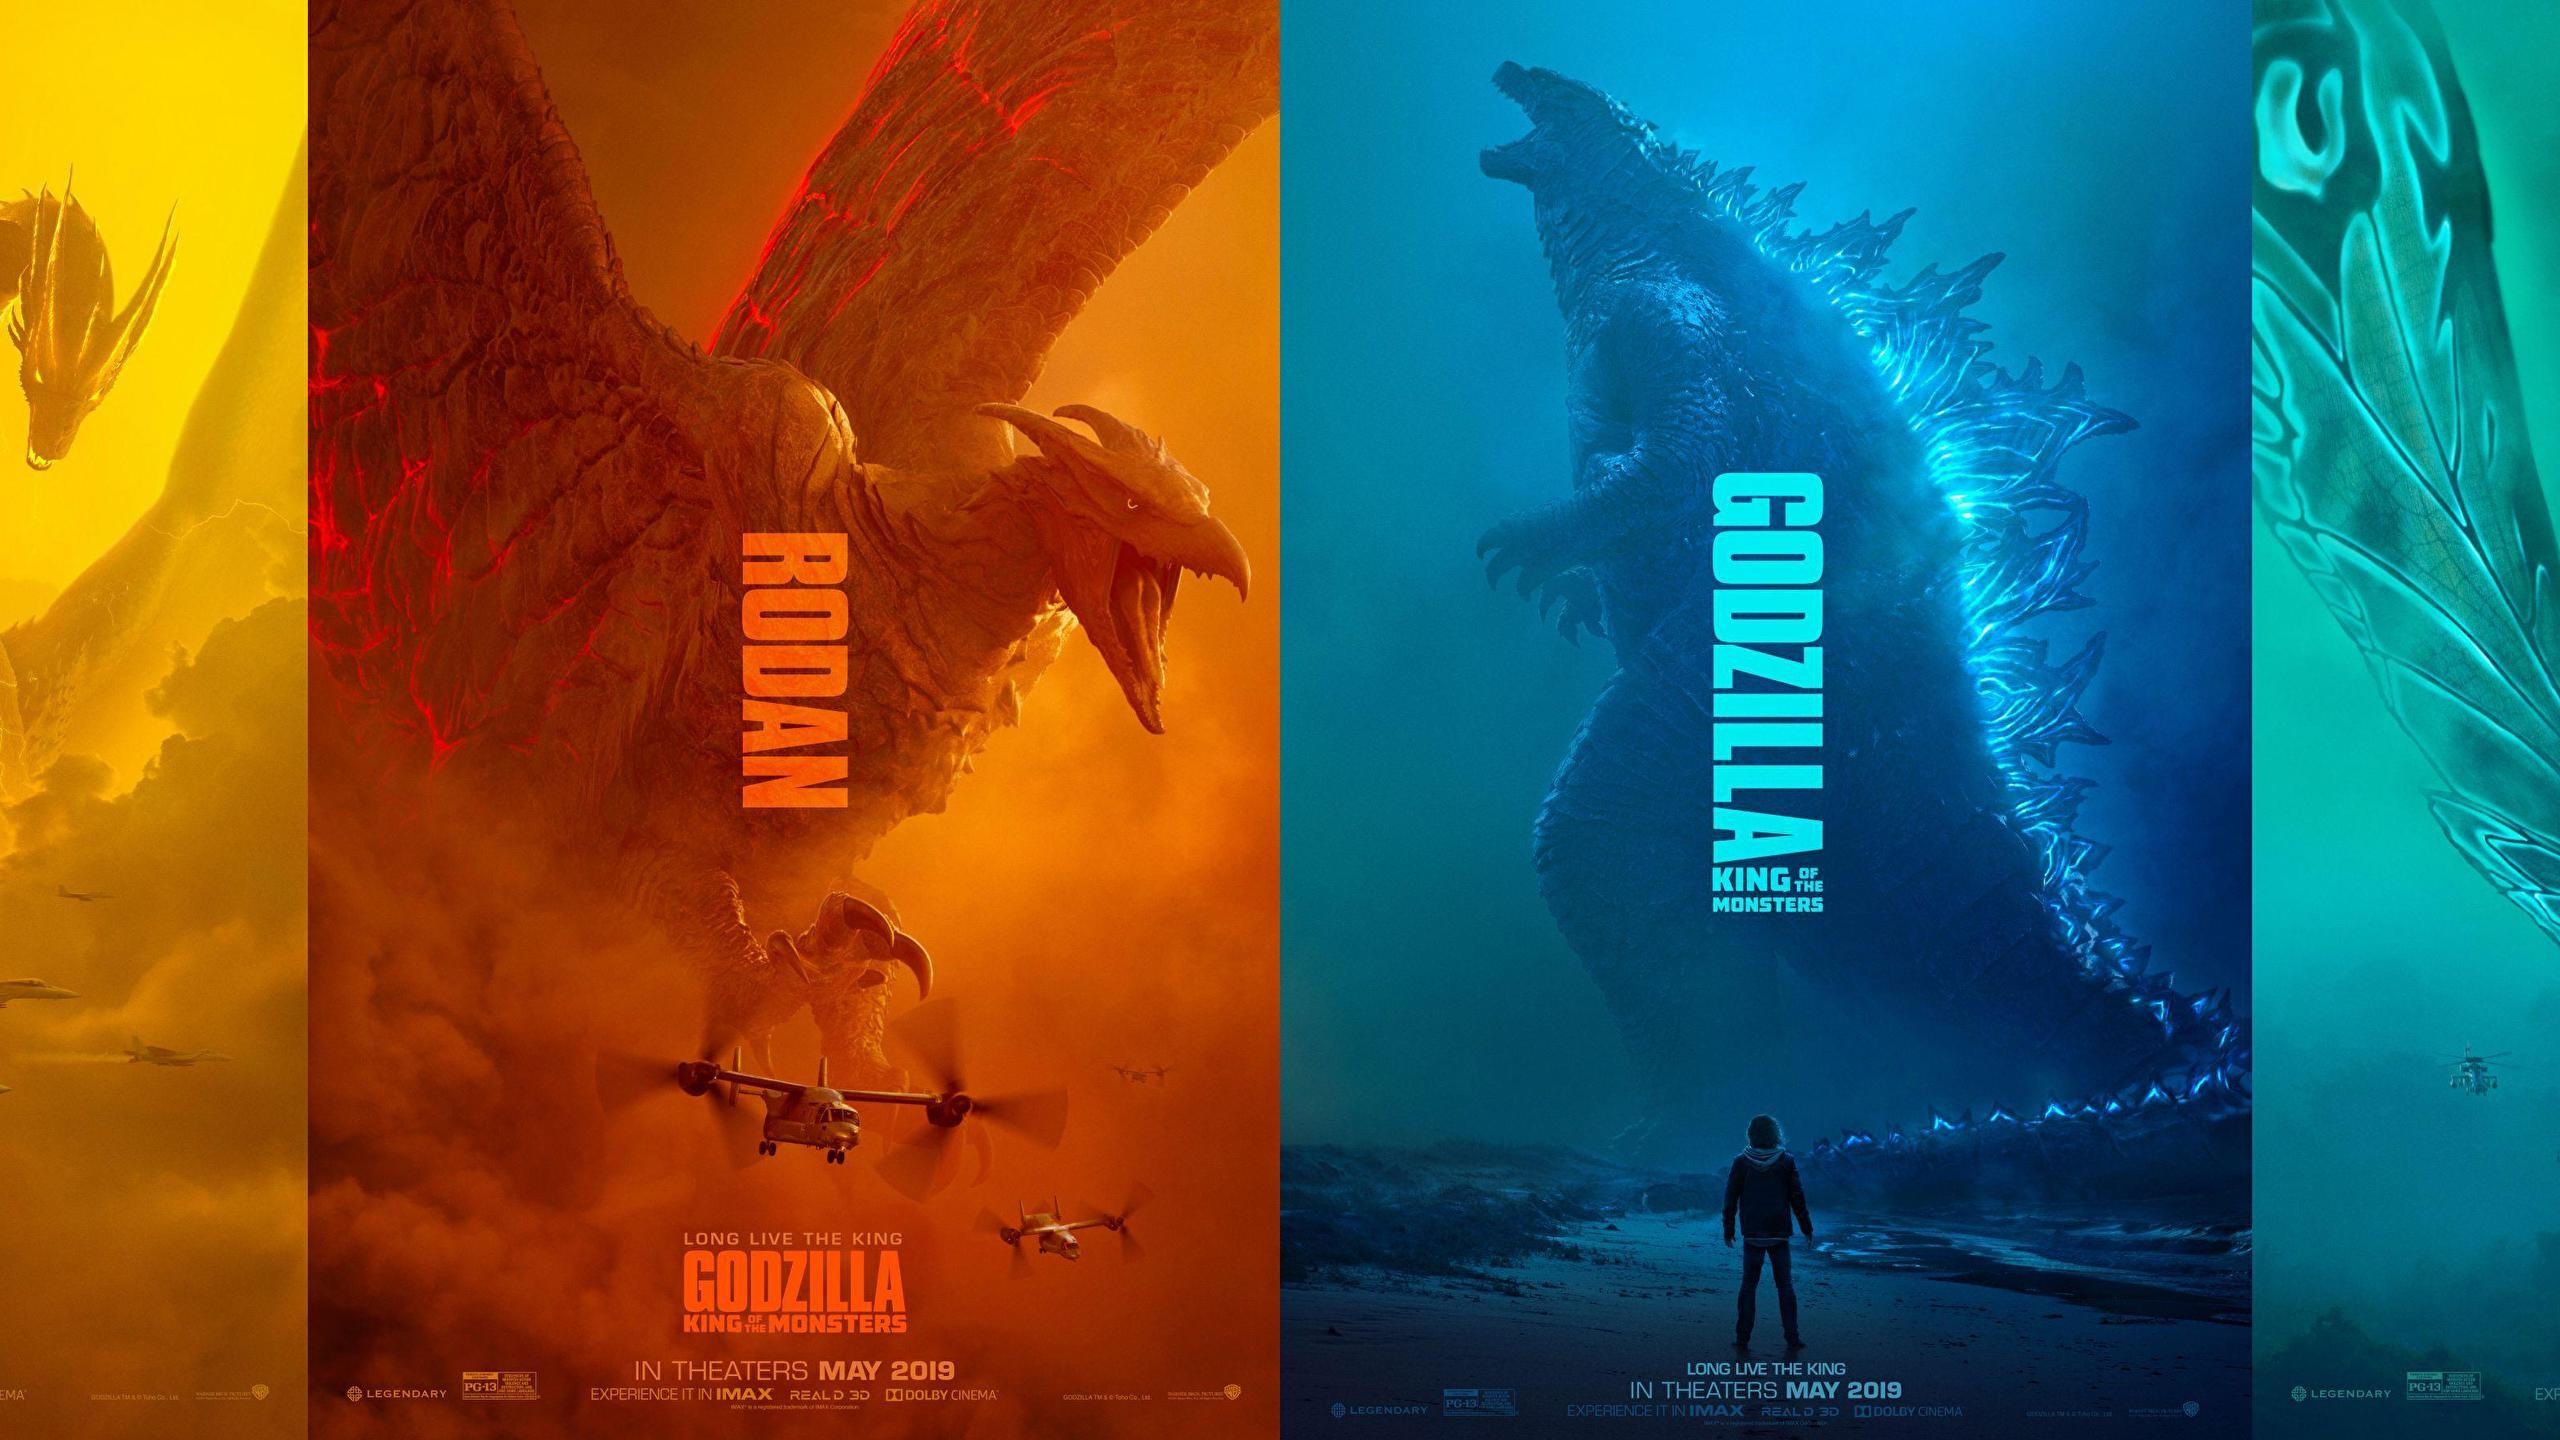 Godzilla Hd Wallpaper 78 Images